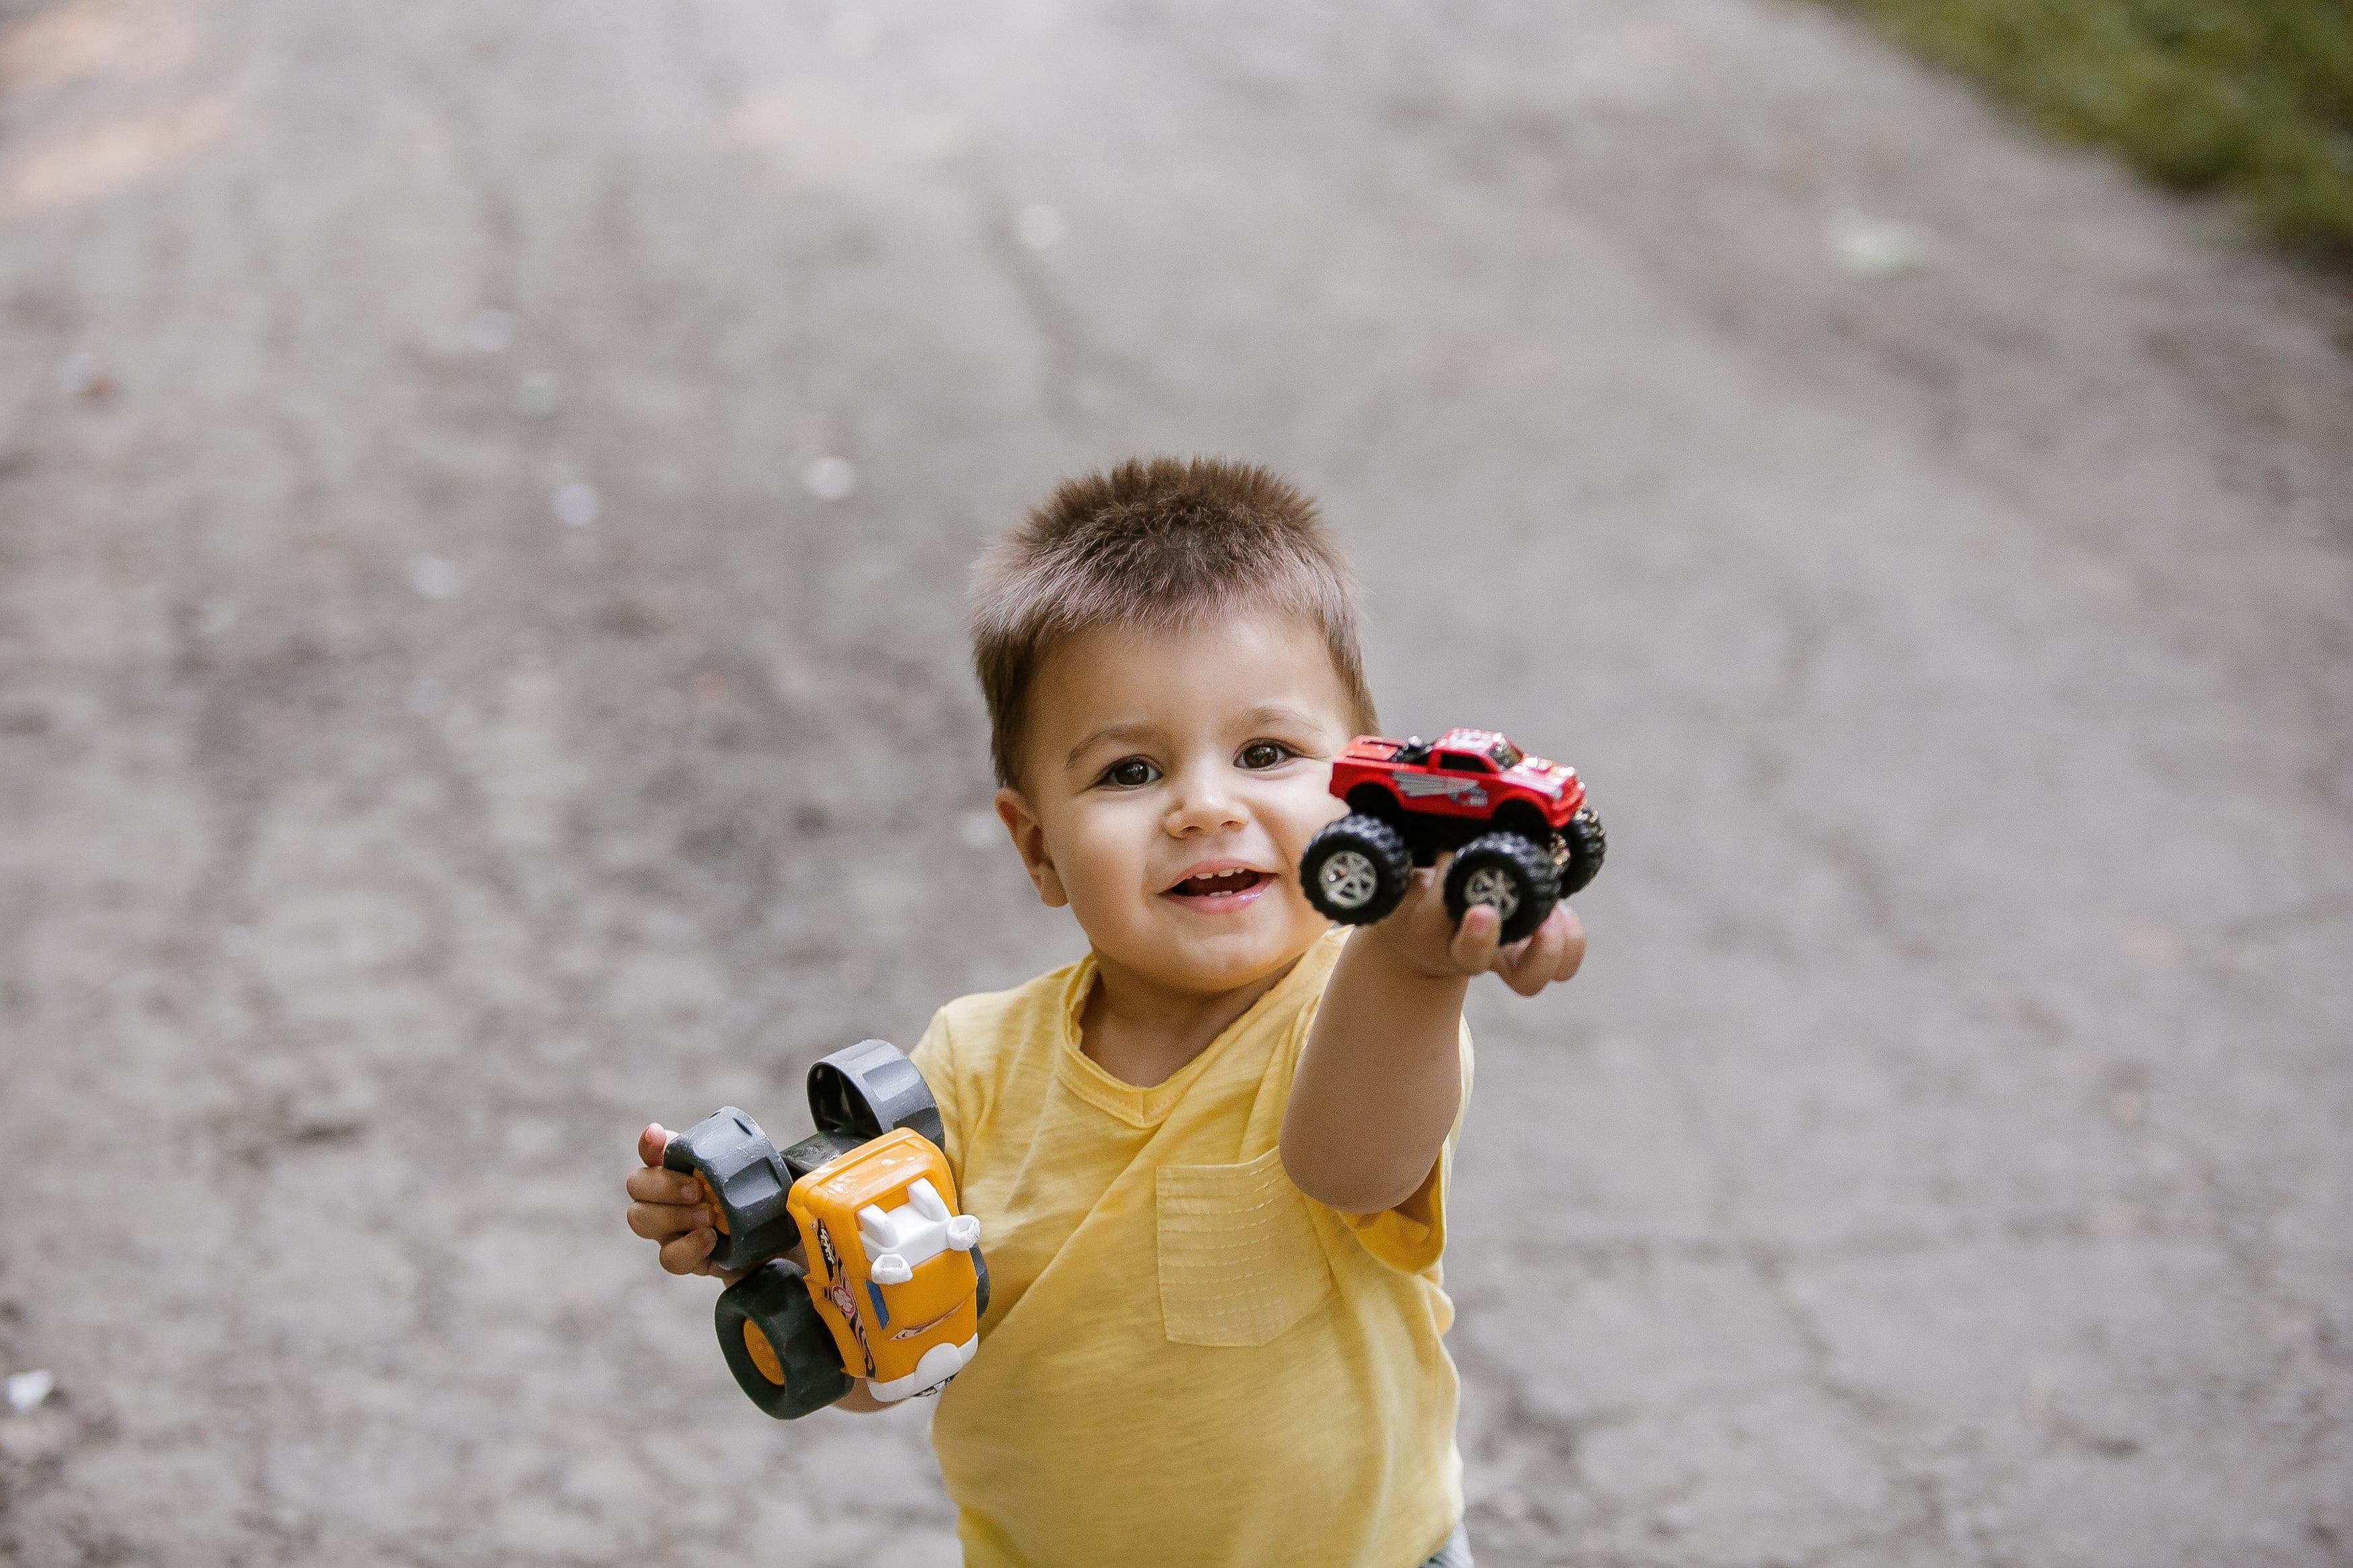 Junge mit Spielzeug Outdoor Fotografie Berlin